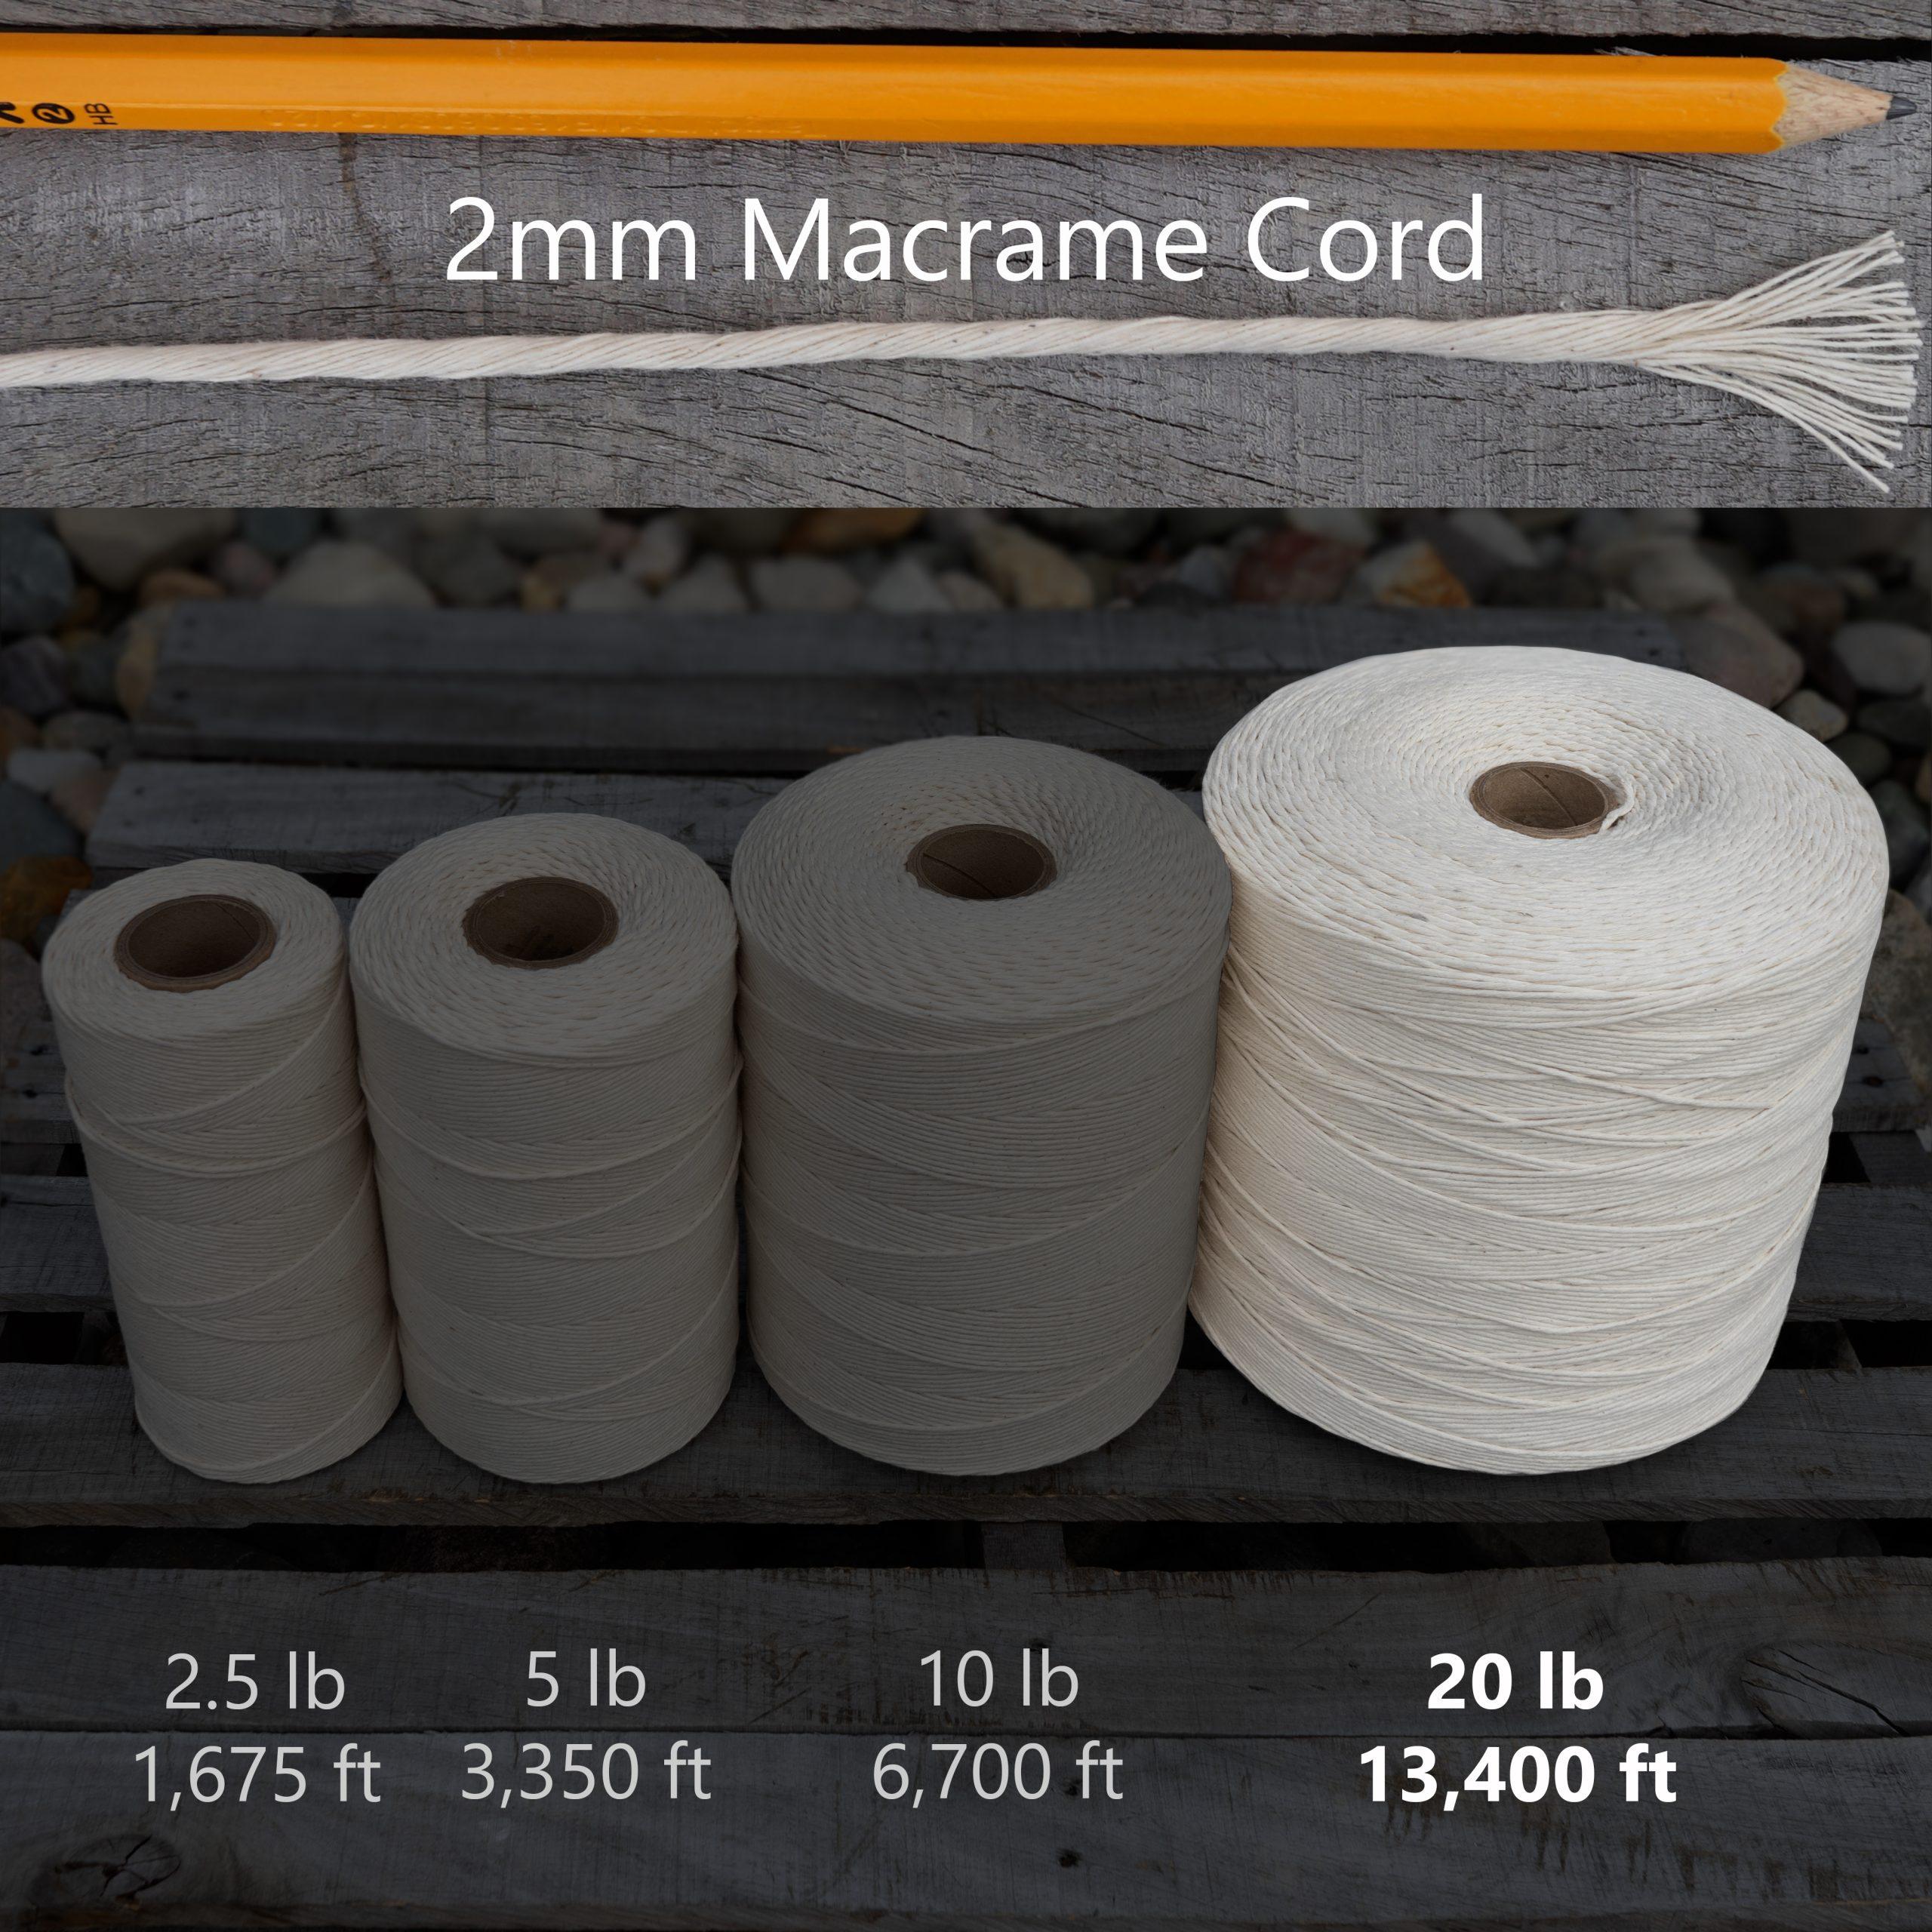 2 mm x 20 lb macrame tube